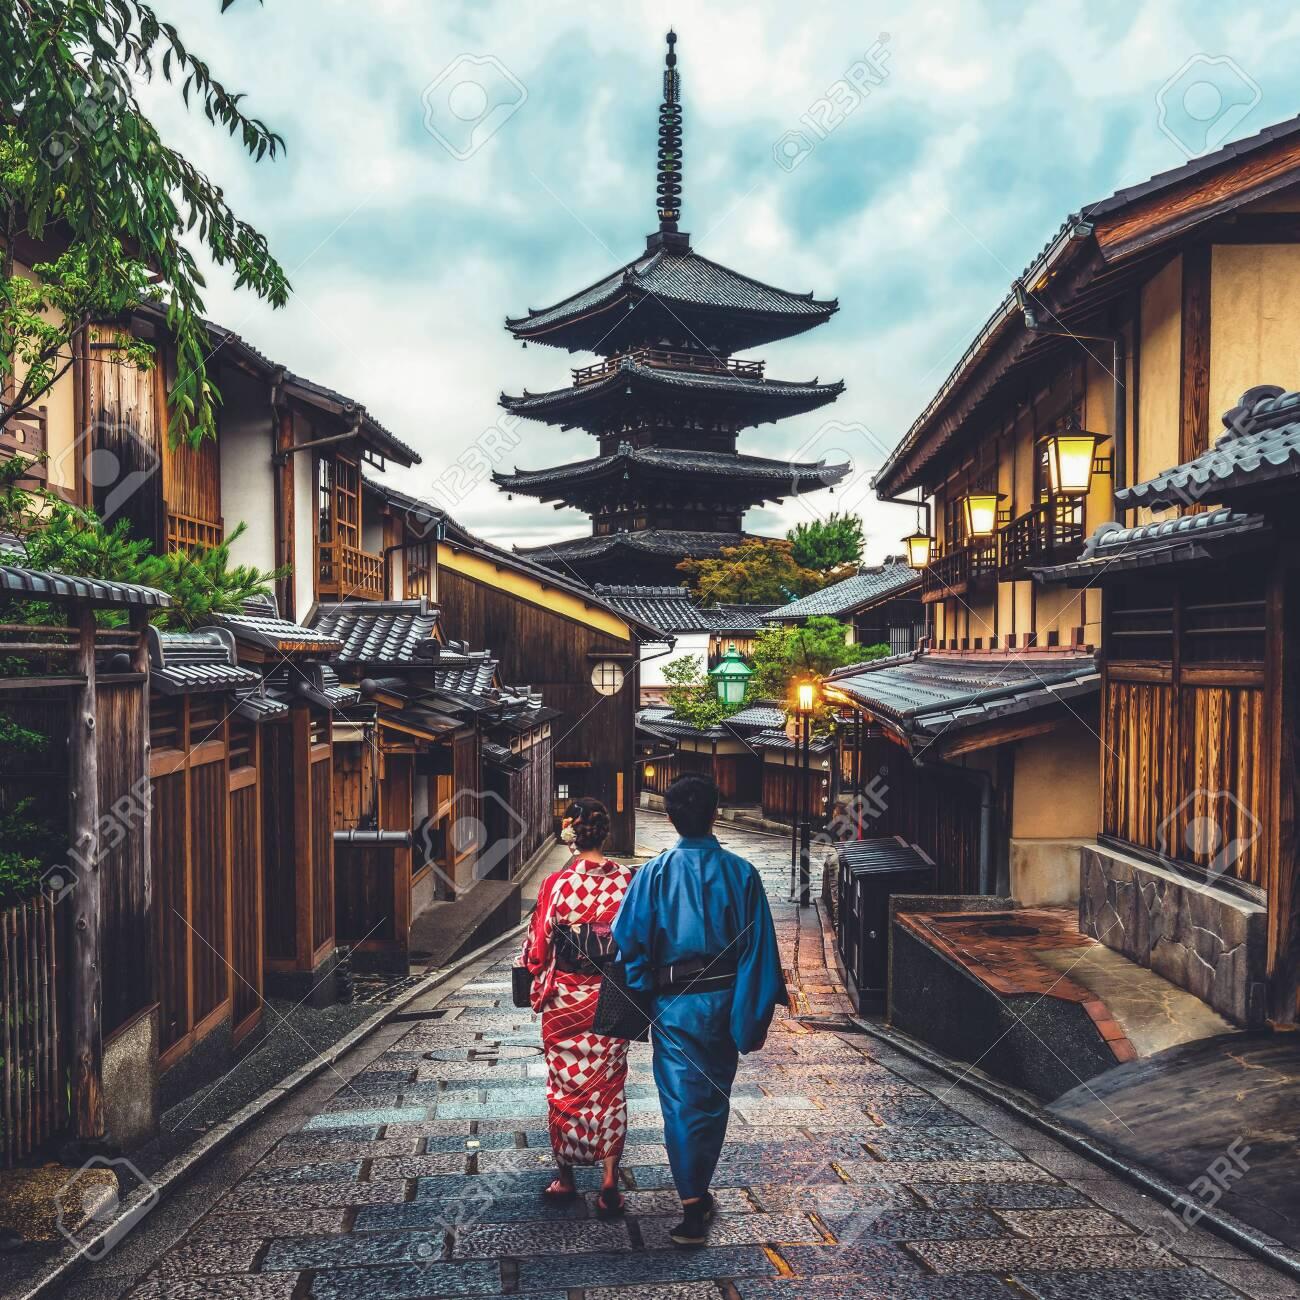 Kyoto, Japan Culture Travel - Asian traveler wearing traditional Japanese kimono walking in Higashiyama district in the old town of Kyoto, Japan. - 121169190